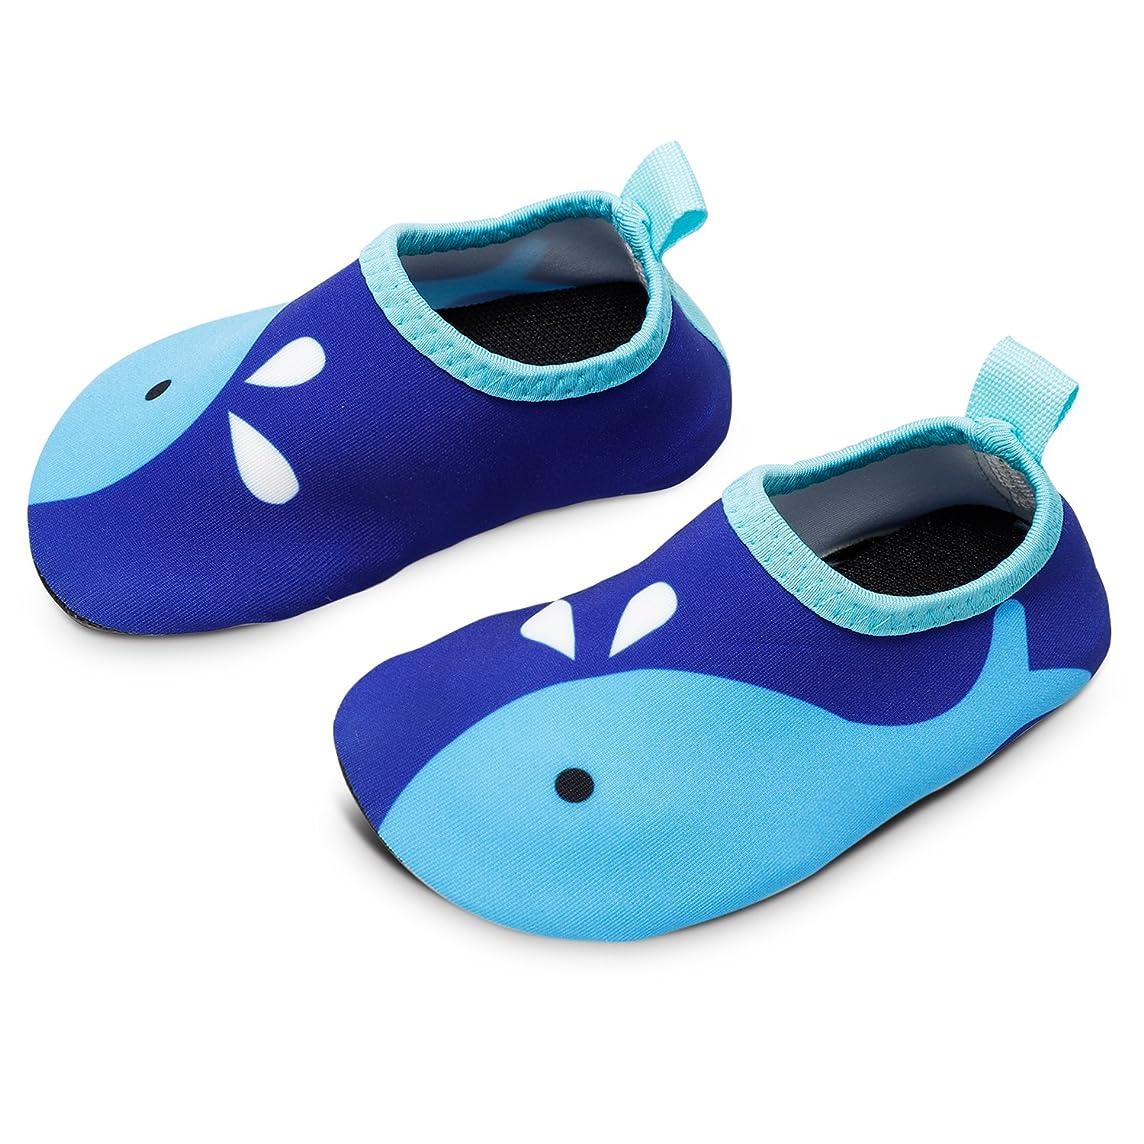 Bigib Toddler Kids Swim Water Shoes Quick Dry Non-Slip Water Skin Barefoot Sports Shoes Aqua?Socks for Boys?Girls?Toddler